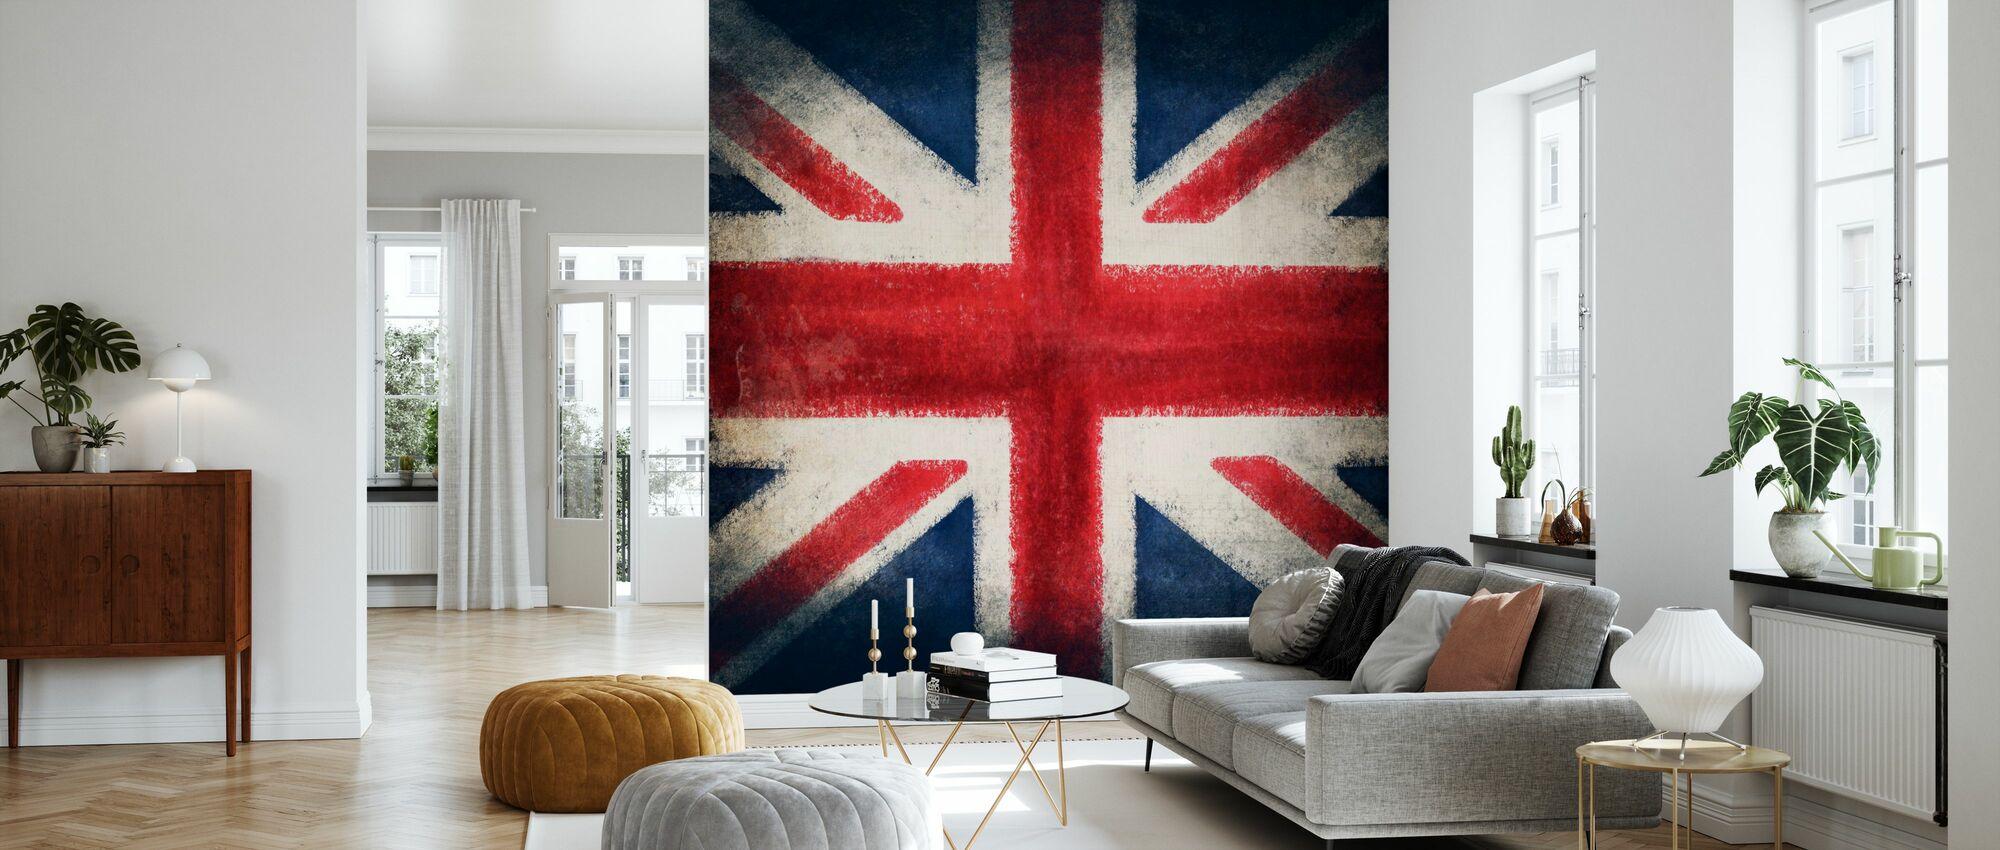 Retro Flag - Wallpaper - Living Room